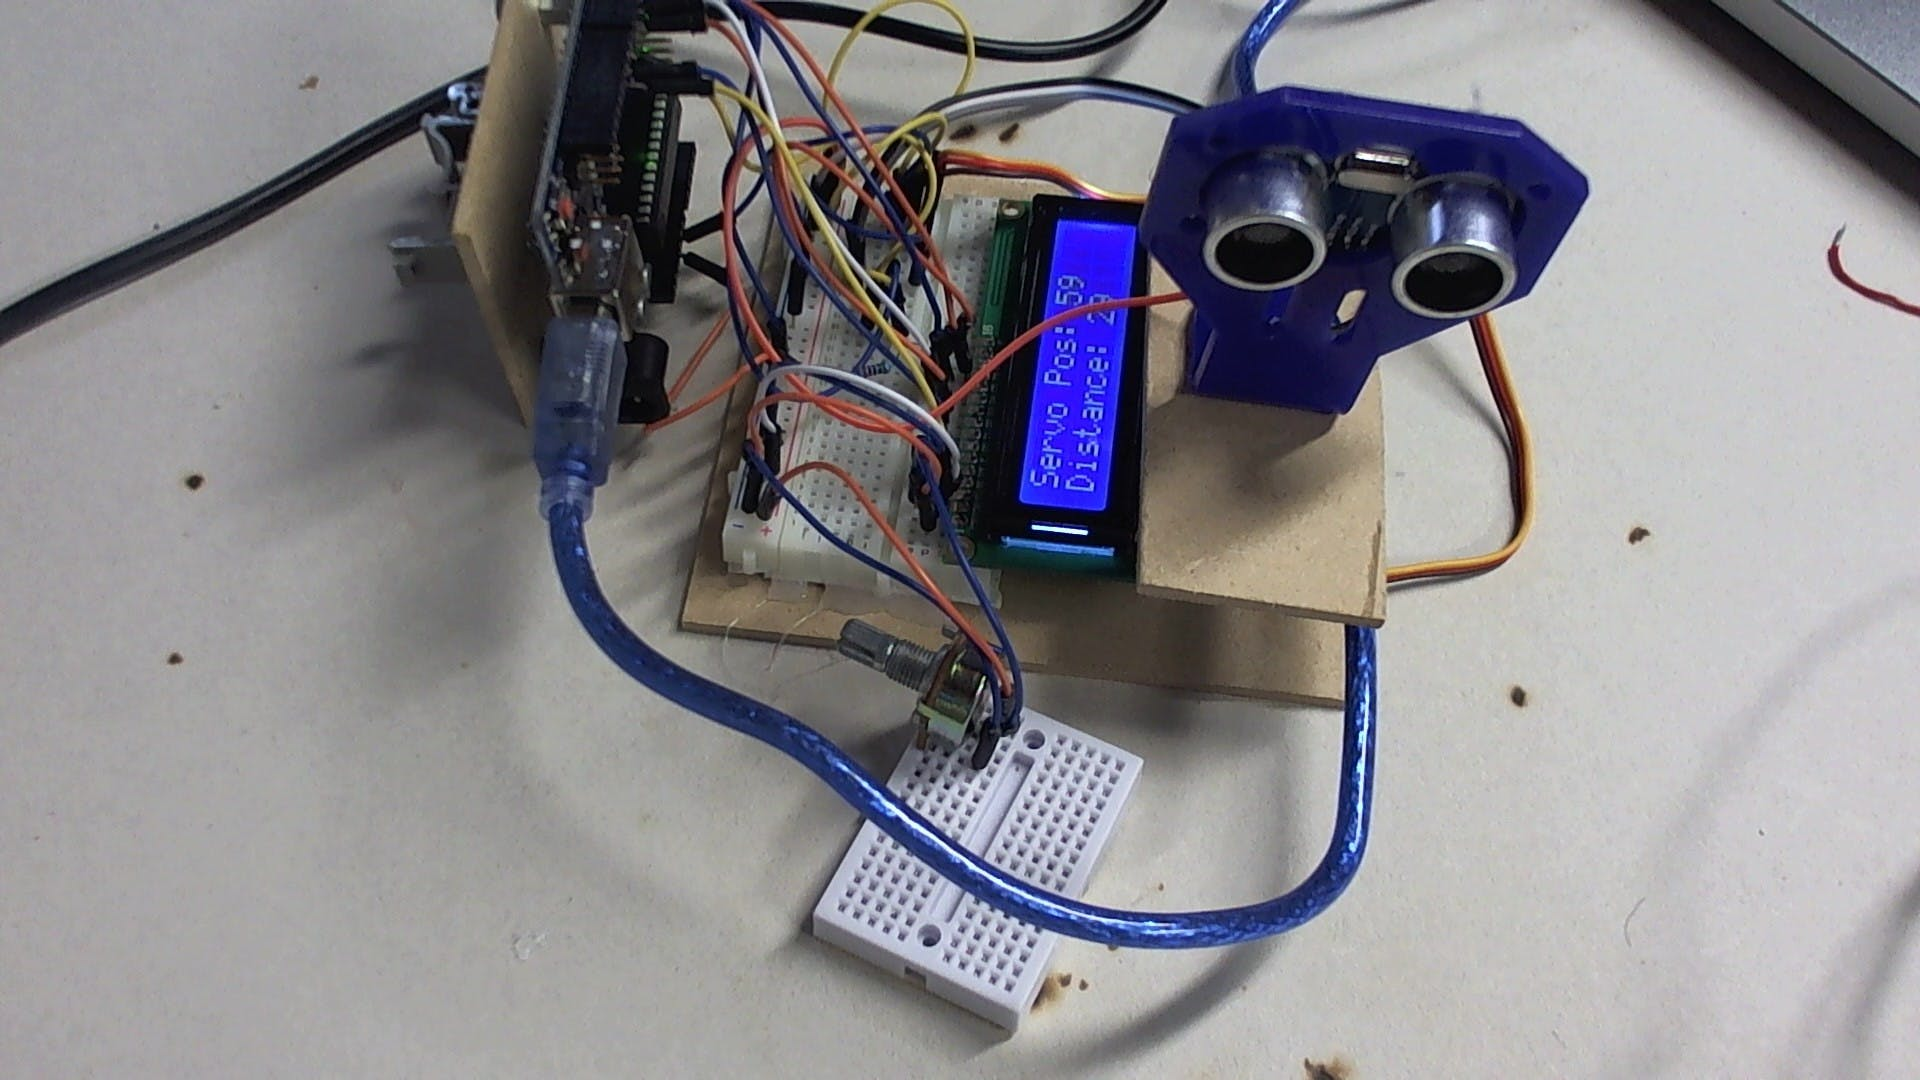 Display Ultrasonic Sensor and Servo